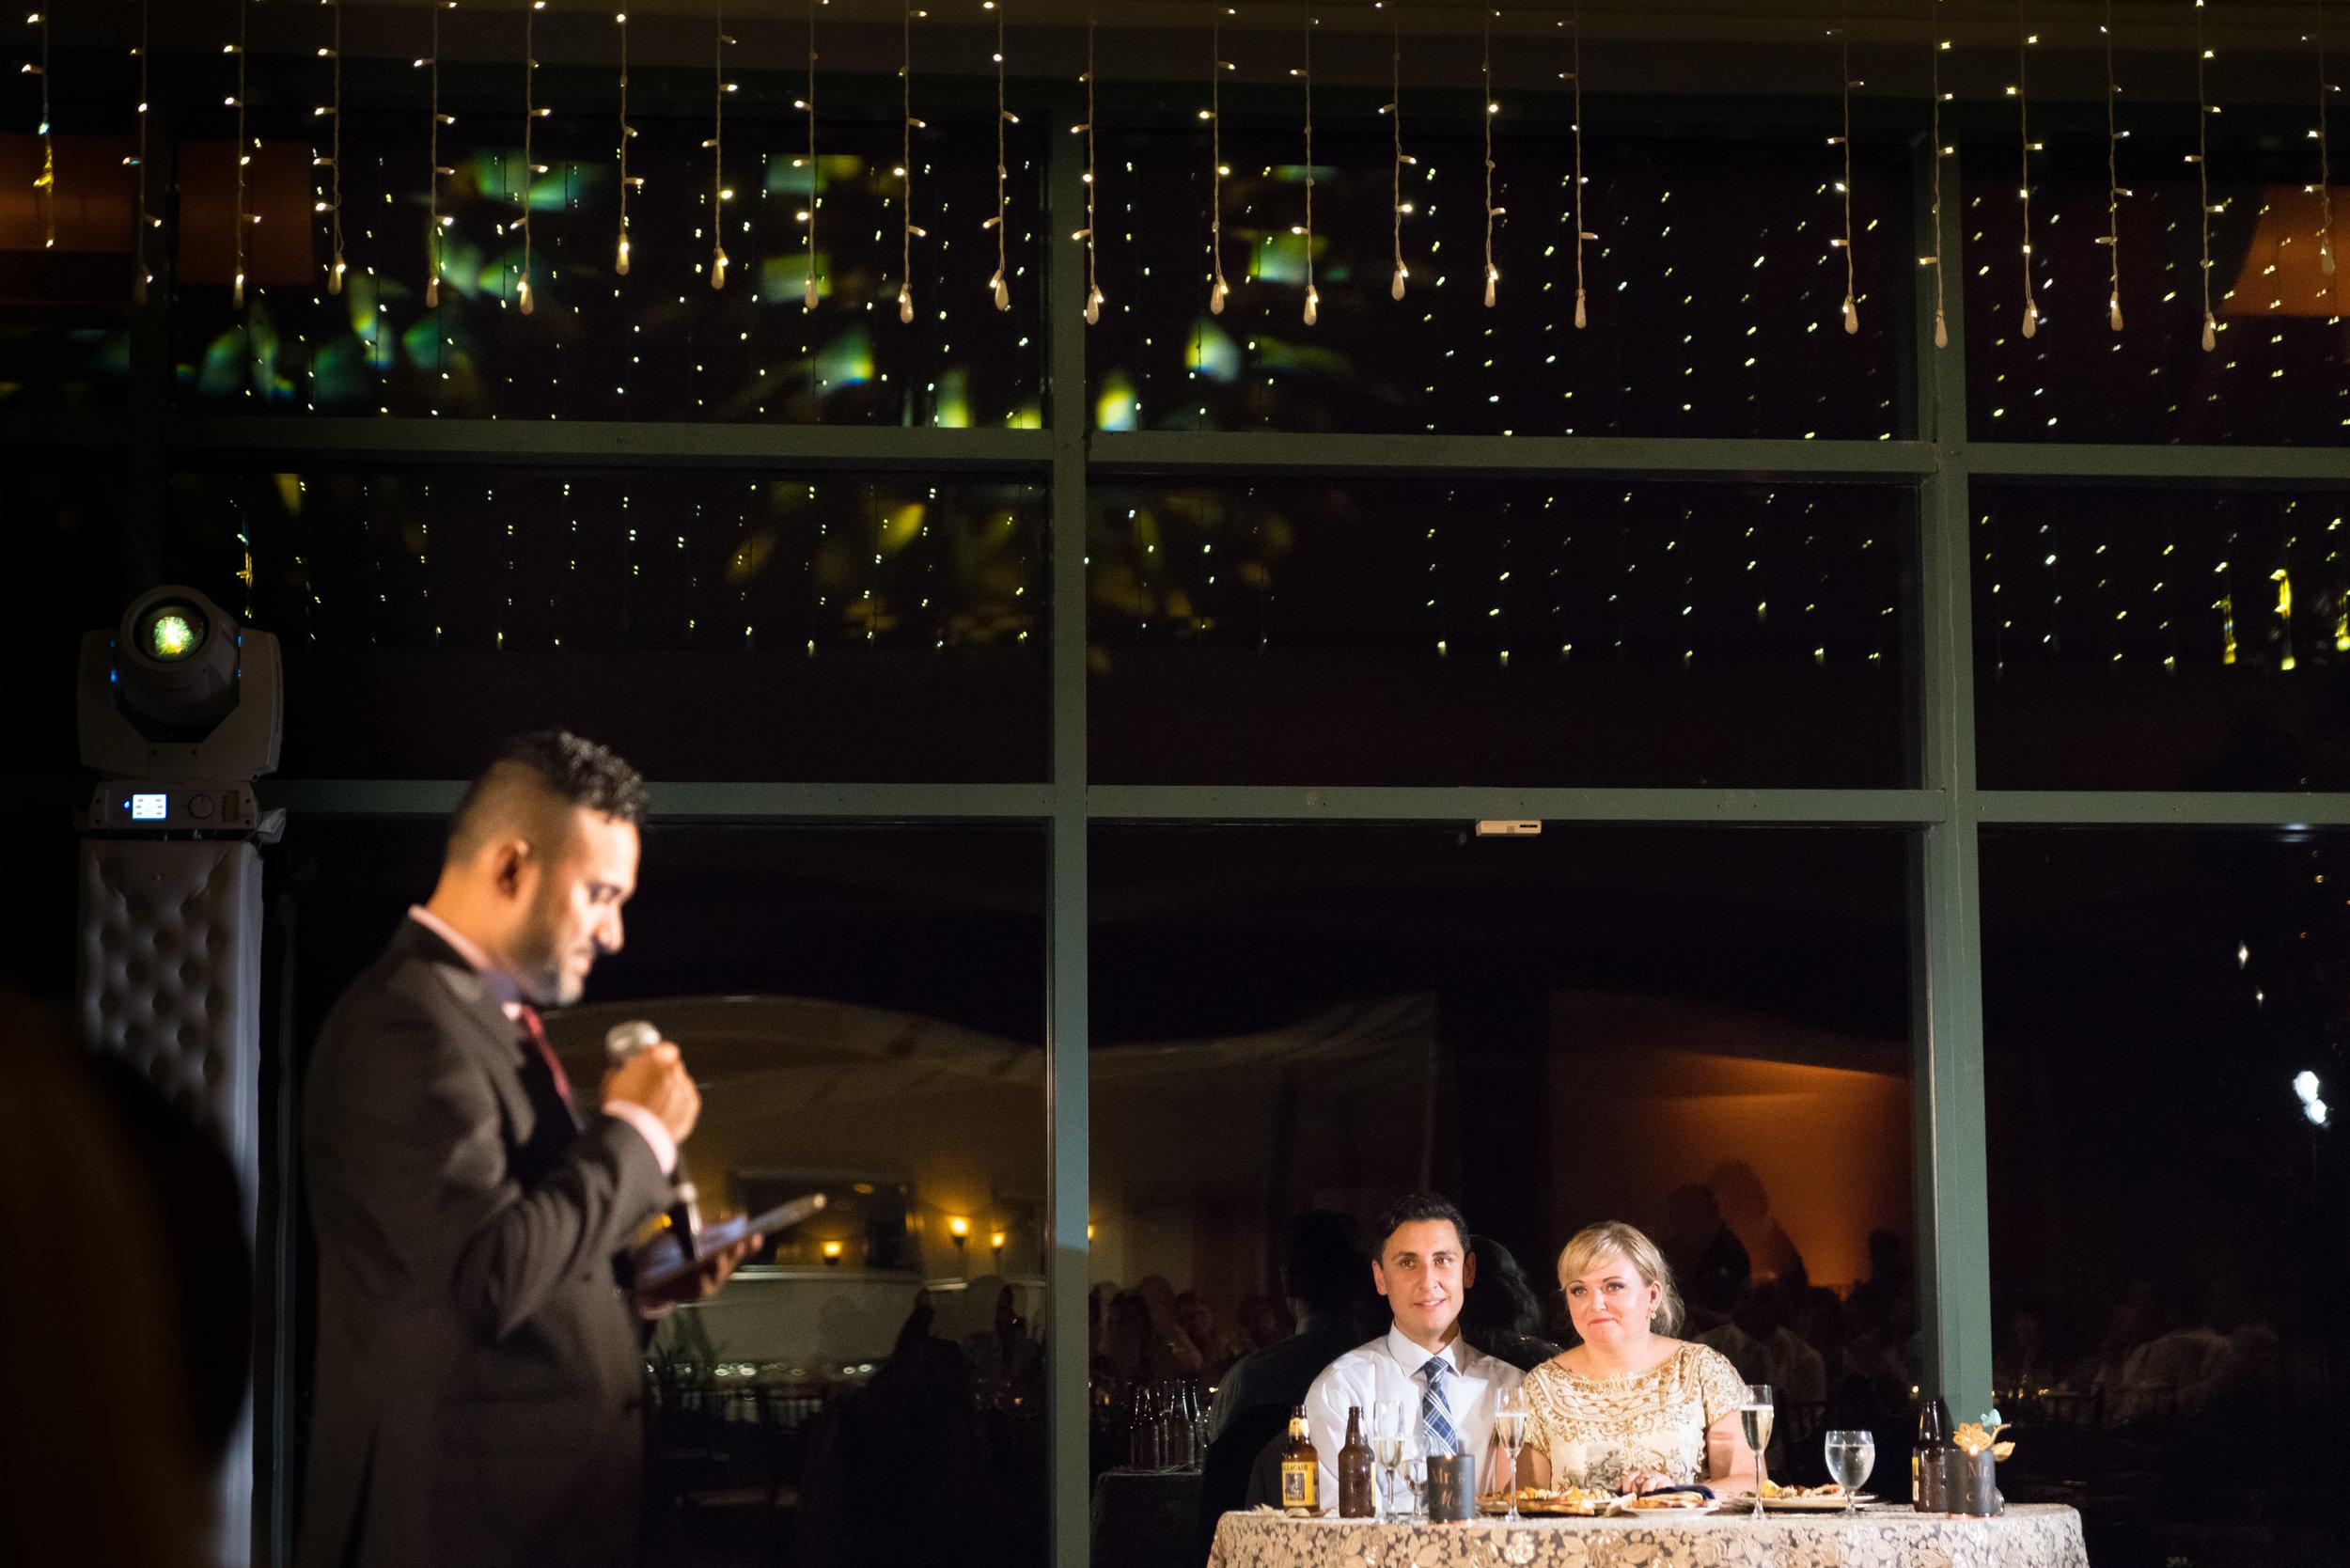 Glass atrium photos for wedding at Meadowlark in Virginia